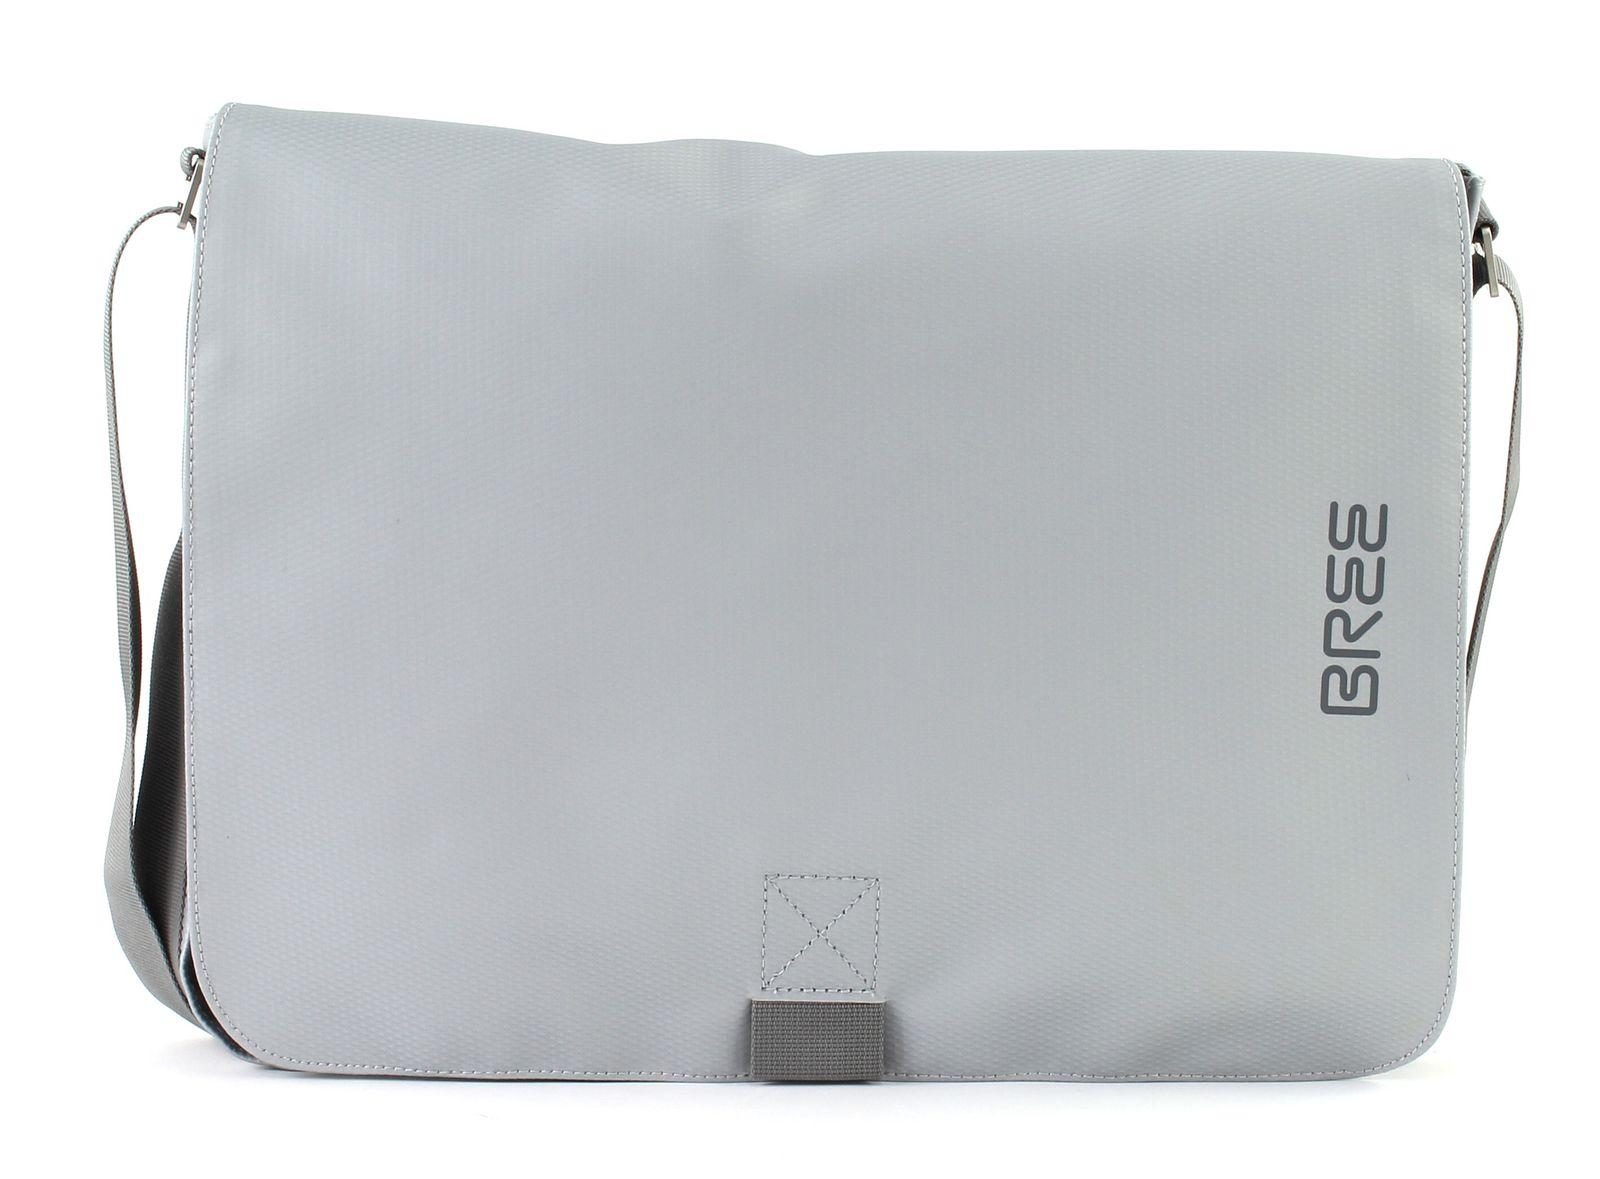 latest discount hot sale hot sale online Details zu BREE Punch 49 Messenger Bag Umhängetasche Laptoptasche Tasche  Chrome Silber